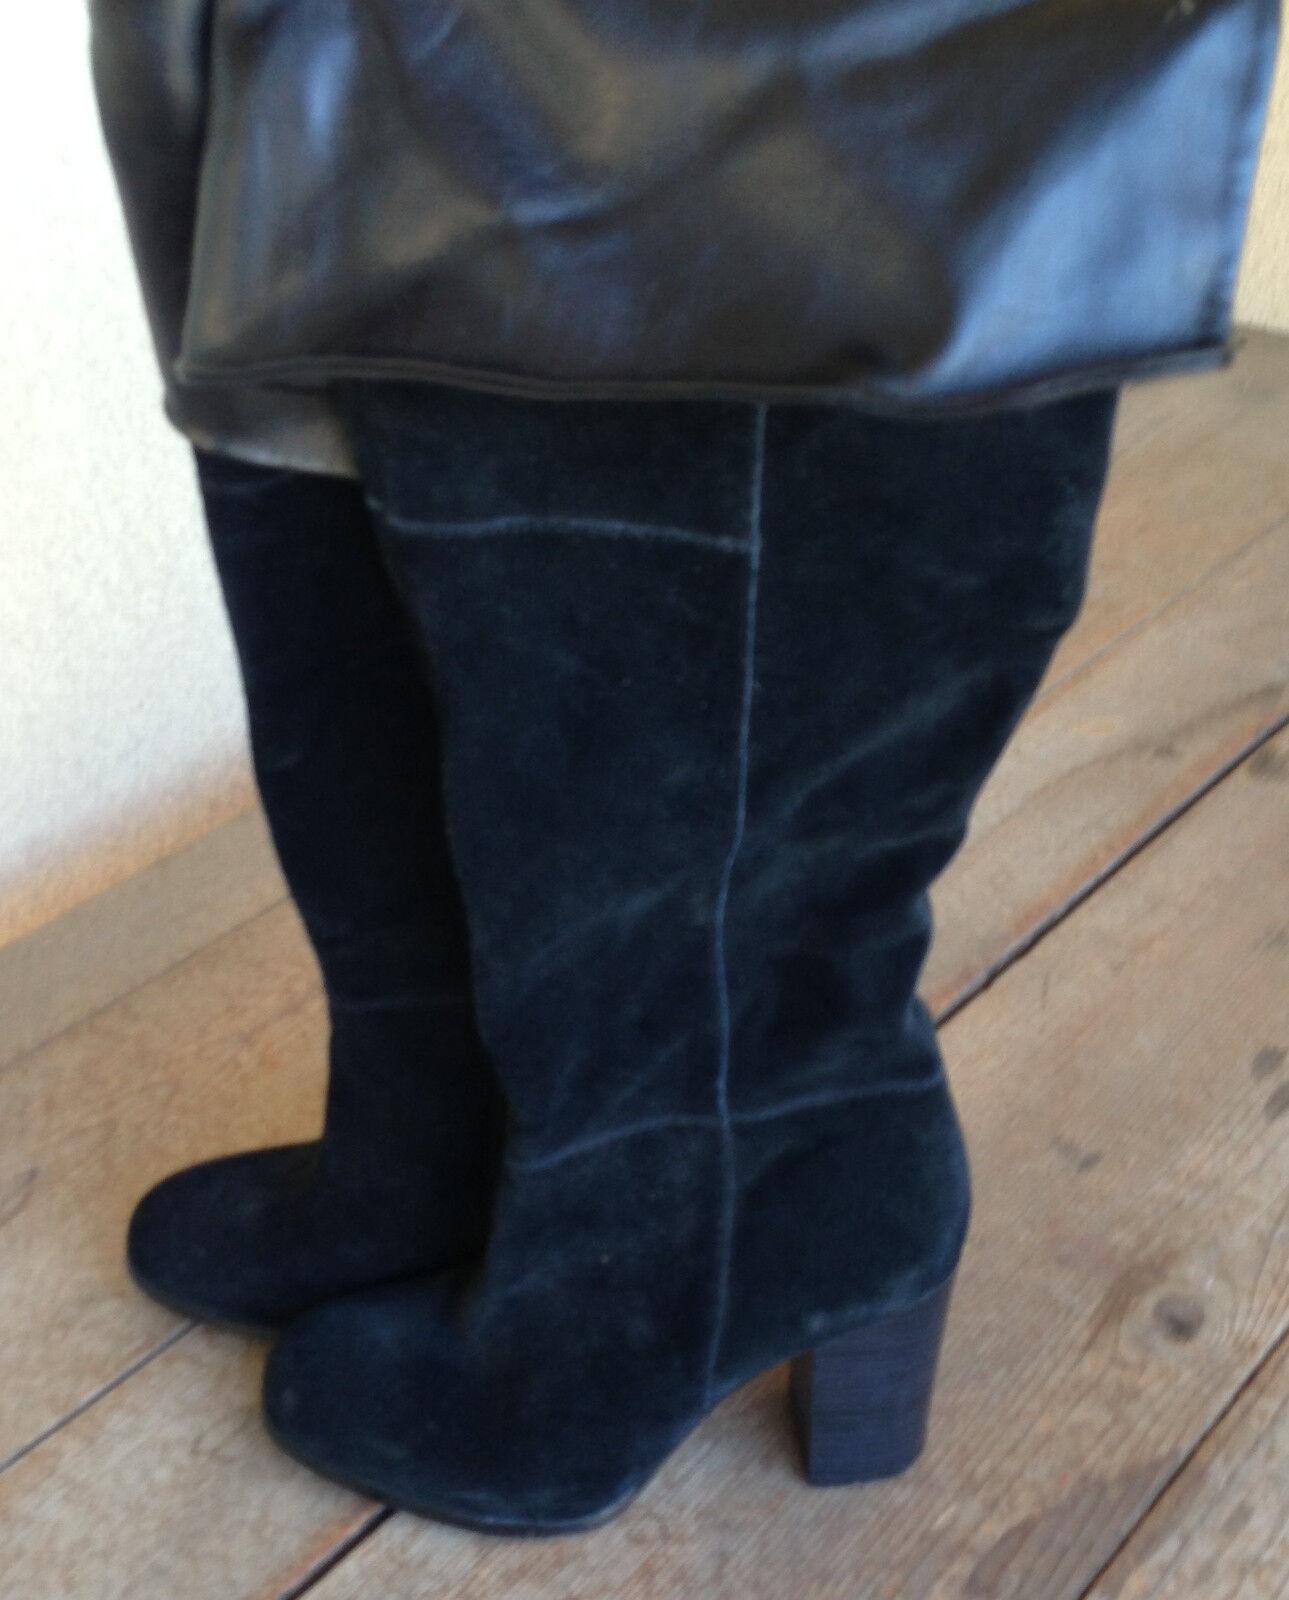 Se Boutique Overknee Schwarzes Damen Veloursleder Piraten Stiefel 8 Damen Schwarzes Zip Innen f96da2